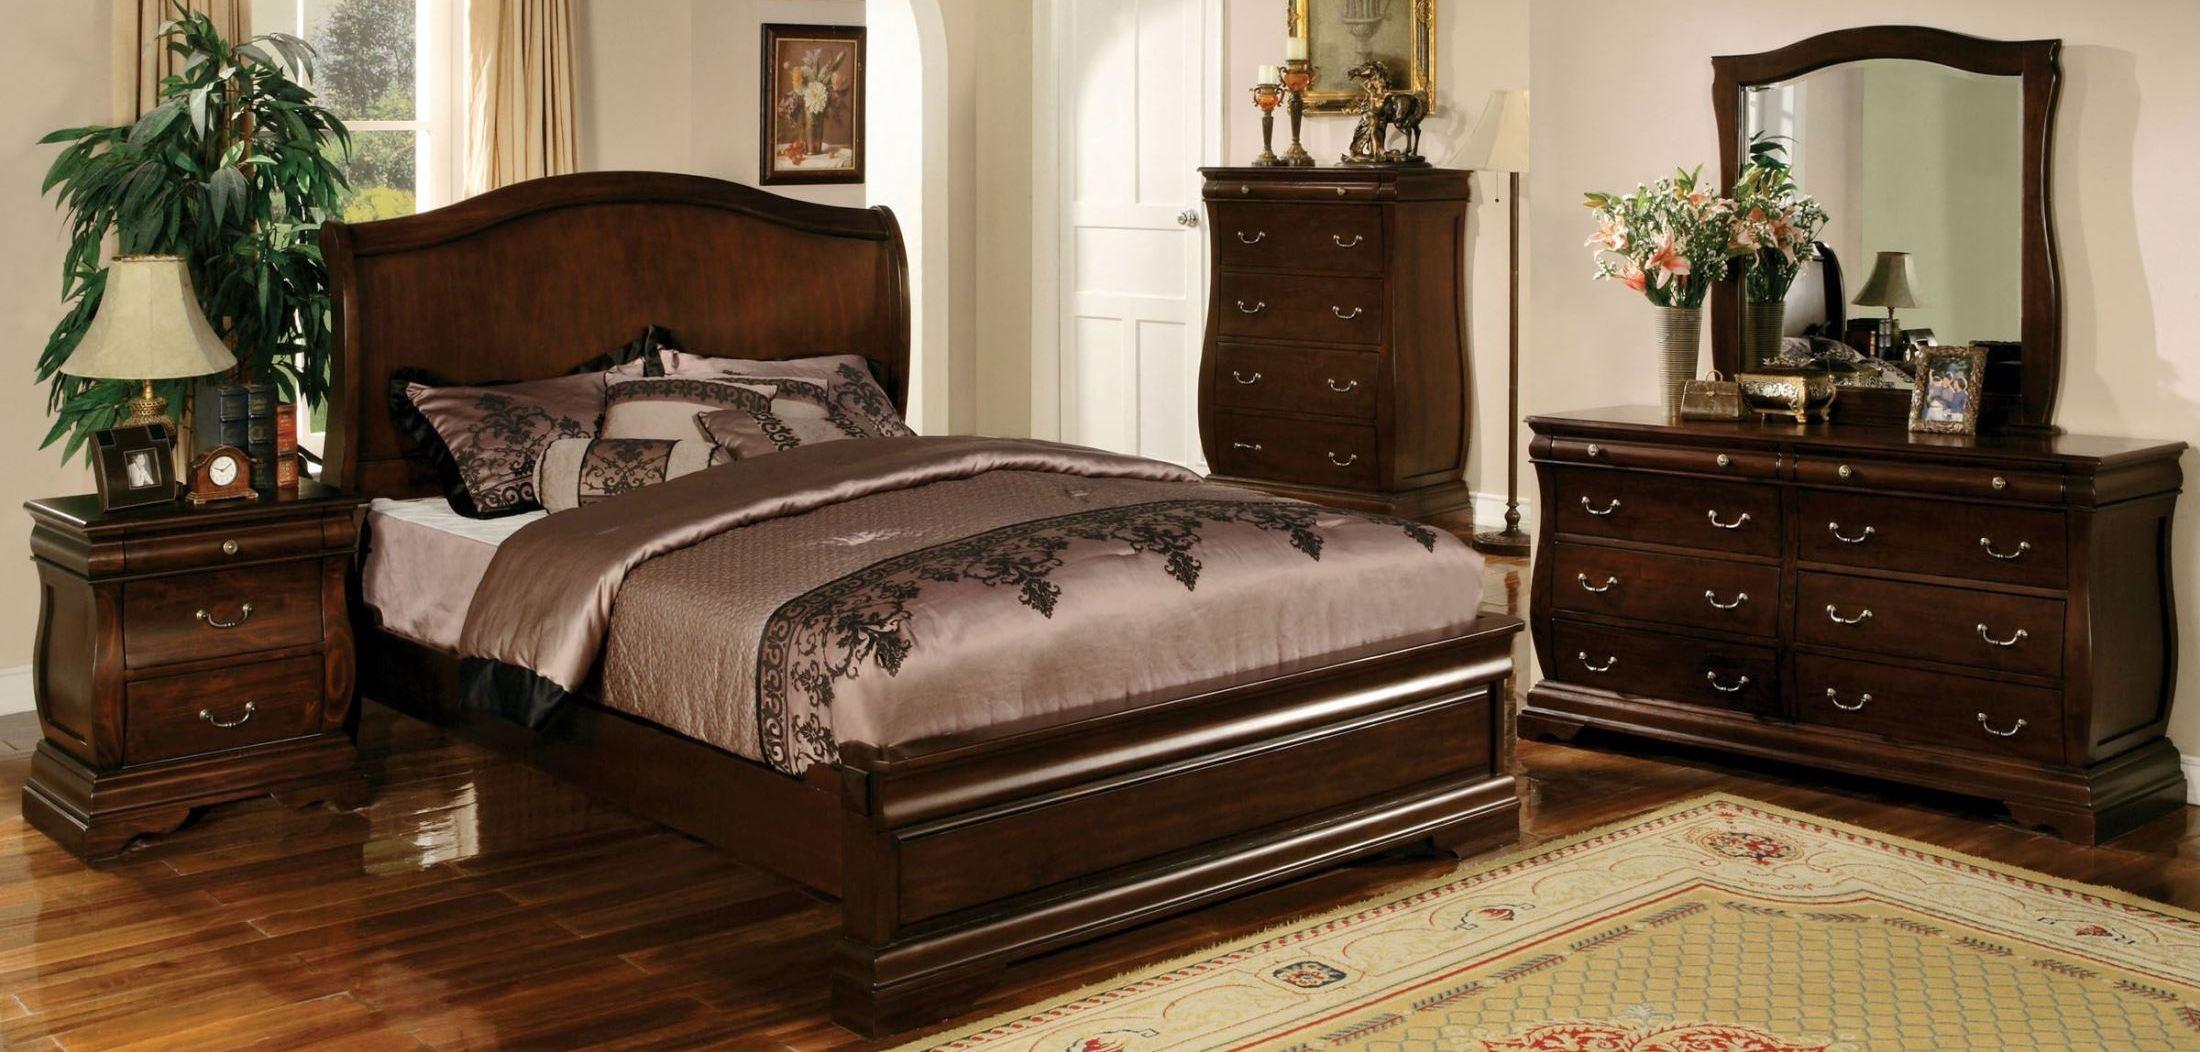 Walnut Bedroom Furniture Sets Esperia Dark Walnut Bedroom Set From Furniture  Of America .